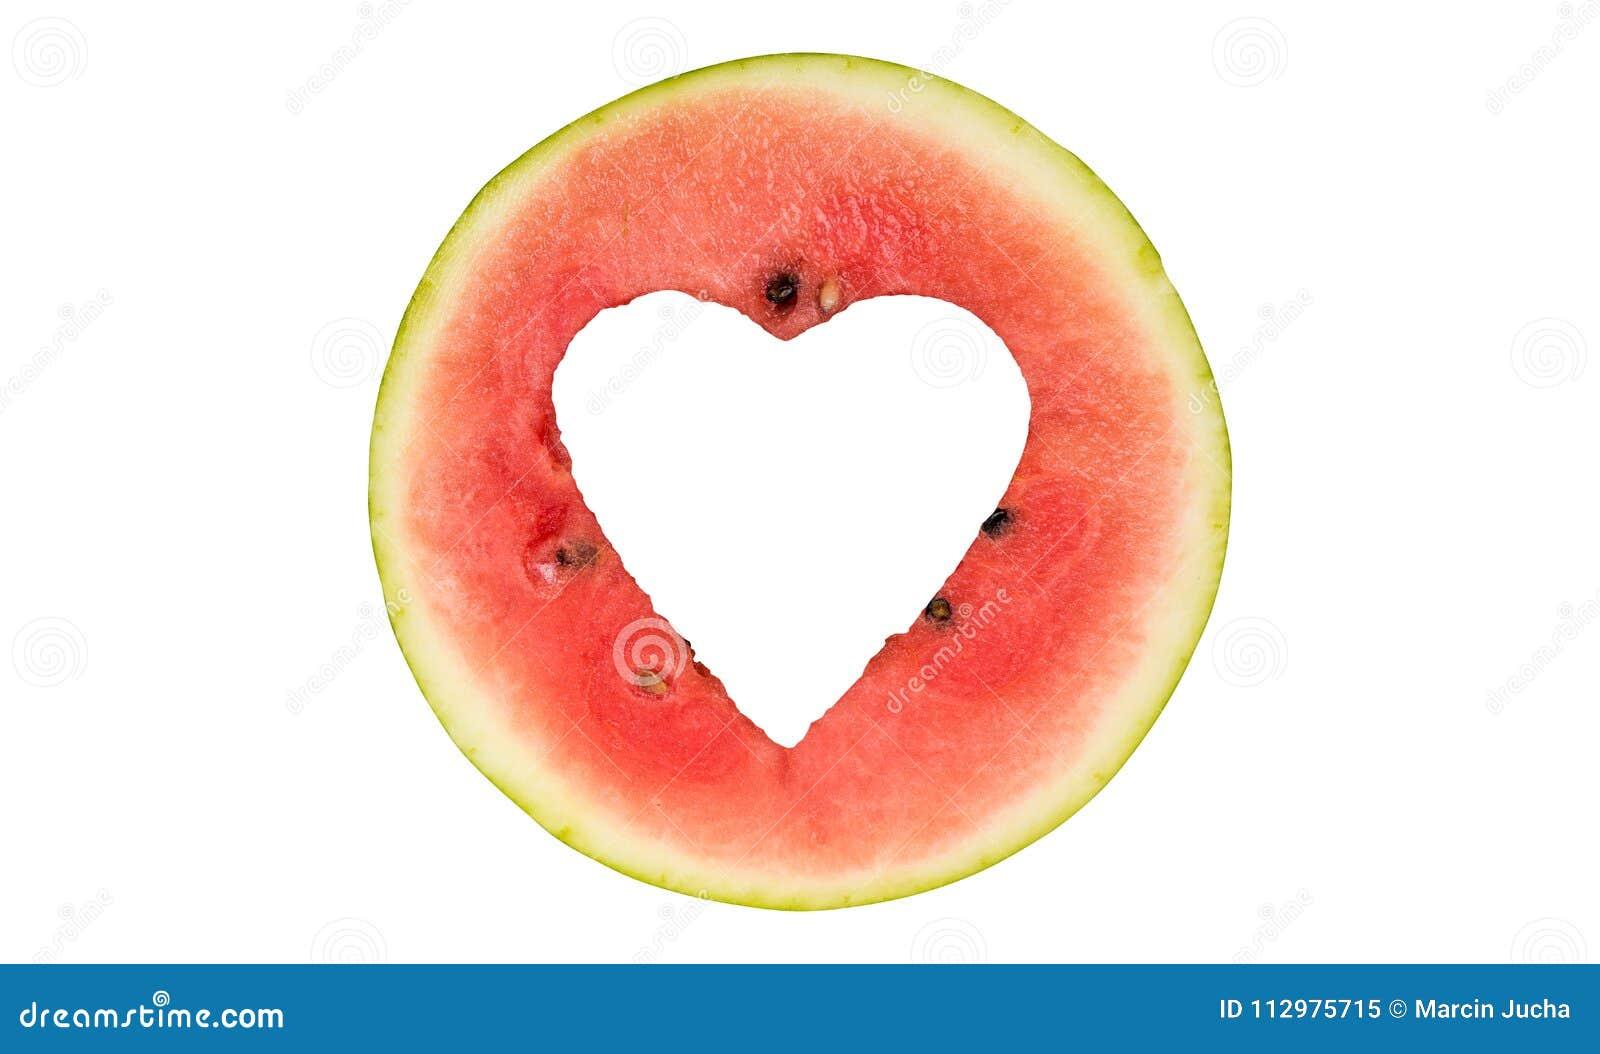 Watermelon hearth shape cut off